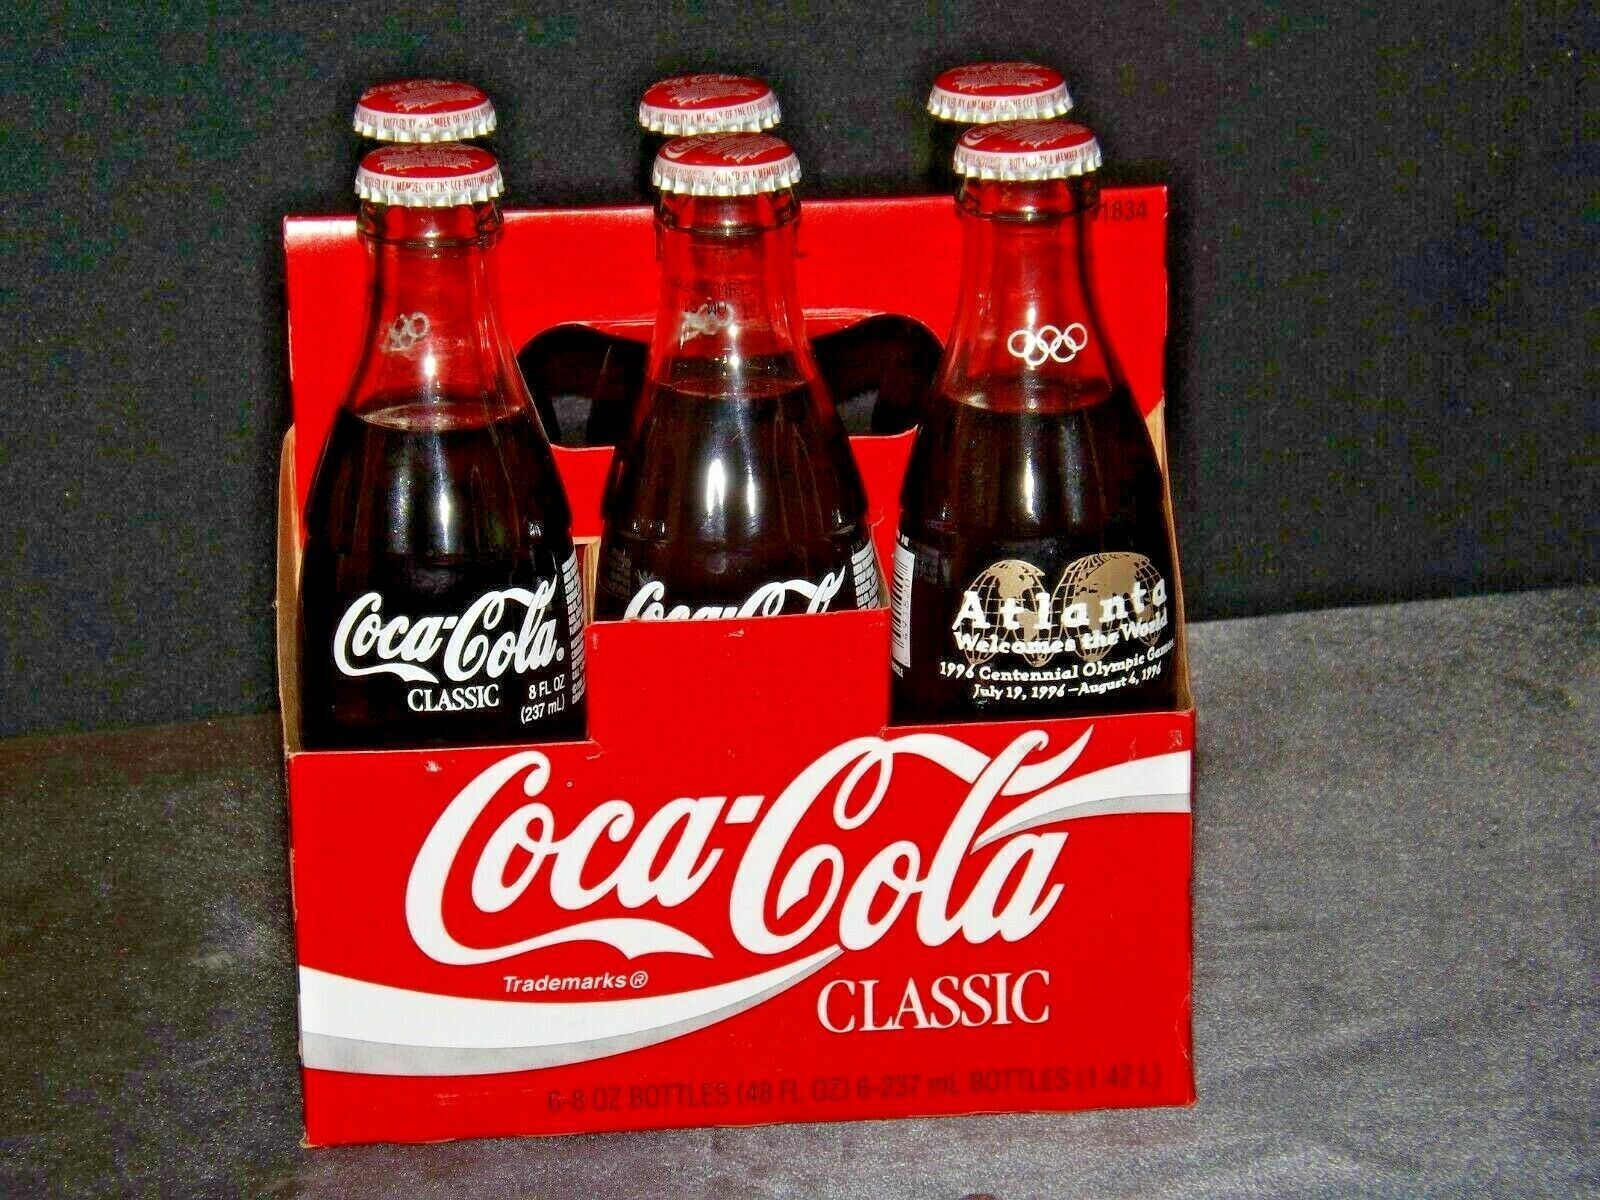 1996 Coca-Cola Classic Commemorative Bottle Series AA-191693 Vintage 49000-0813